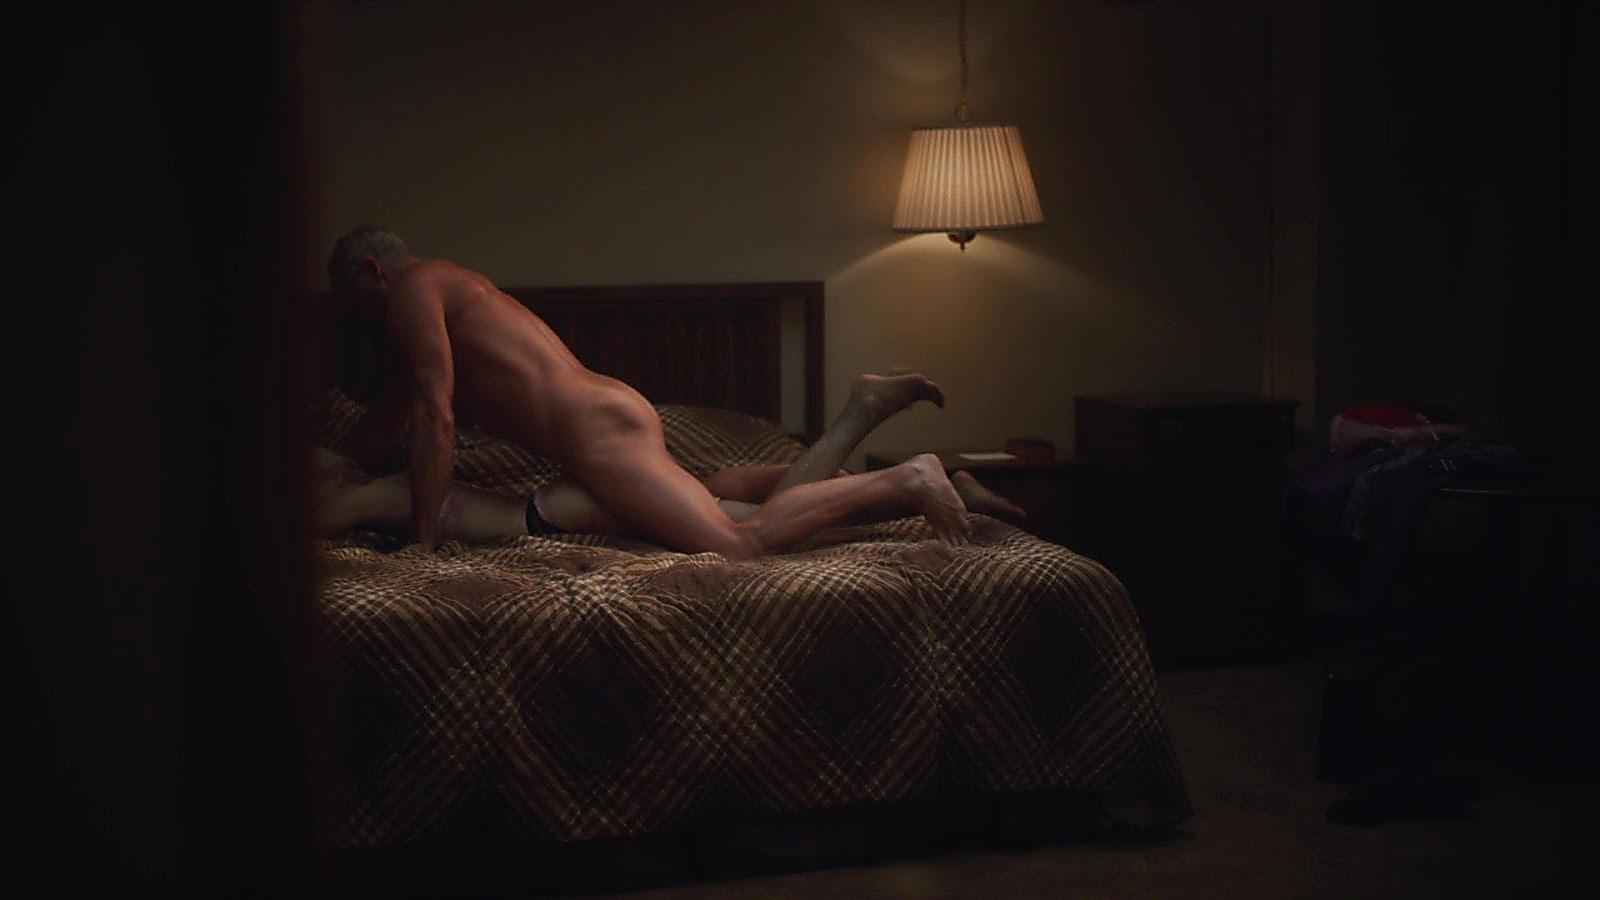 Eric Dane sexy shirtless scene June 17, 2019, 9am